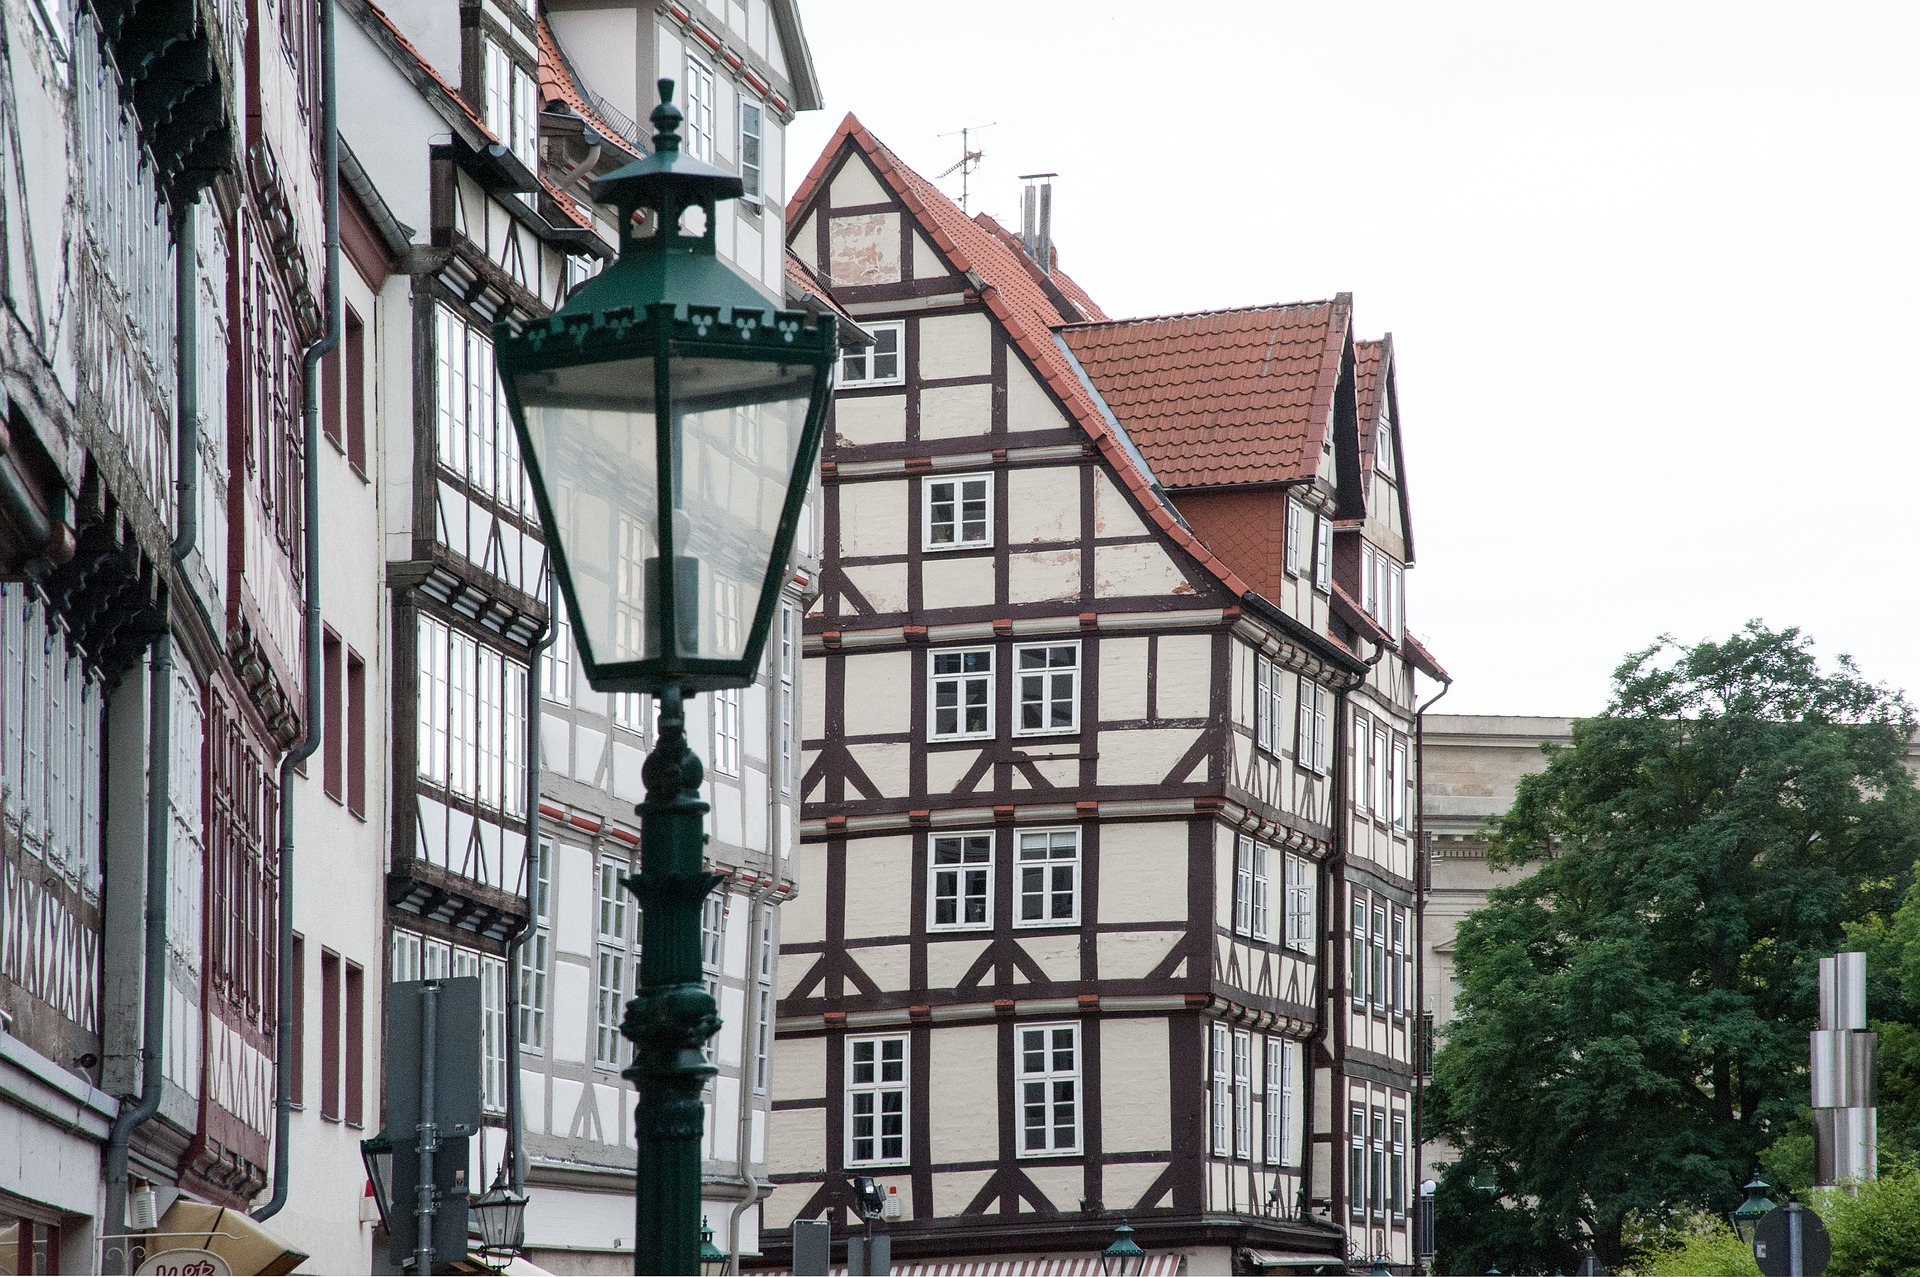 Wunderbares Fachwerkhaus in 30419 Hannover